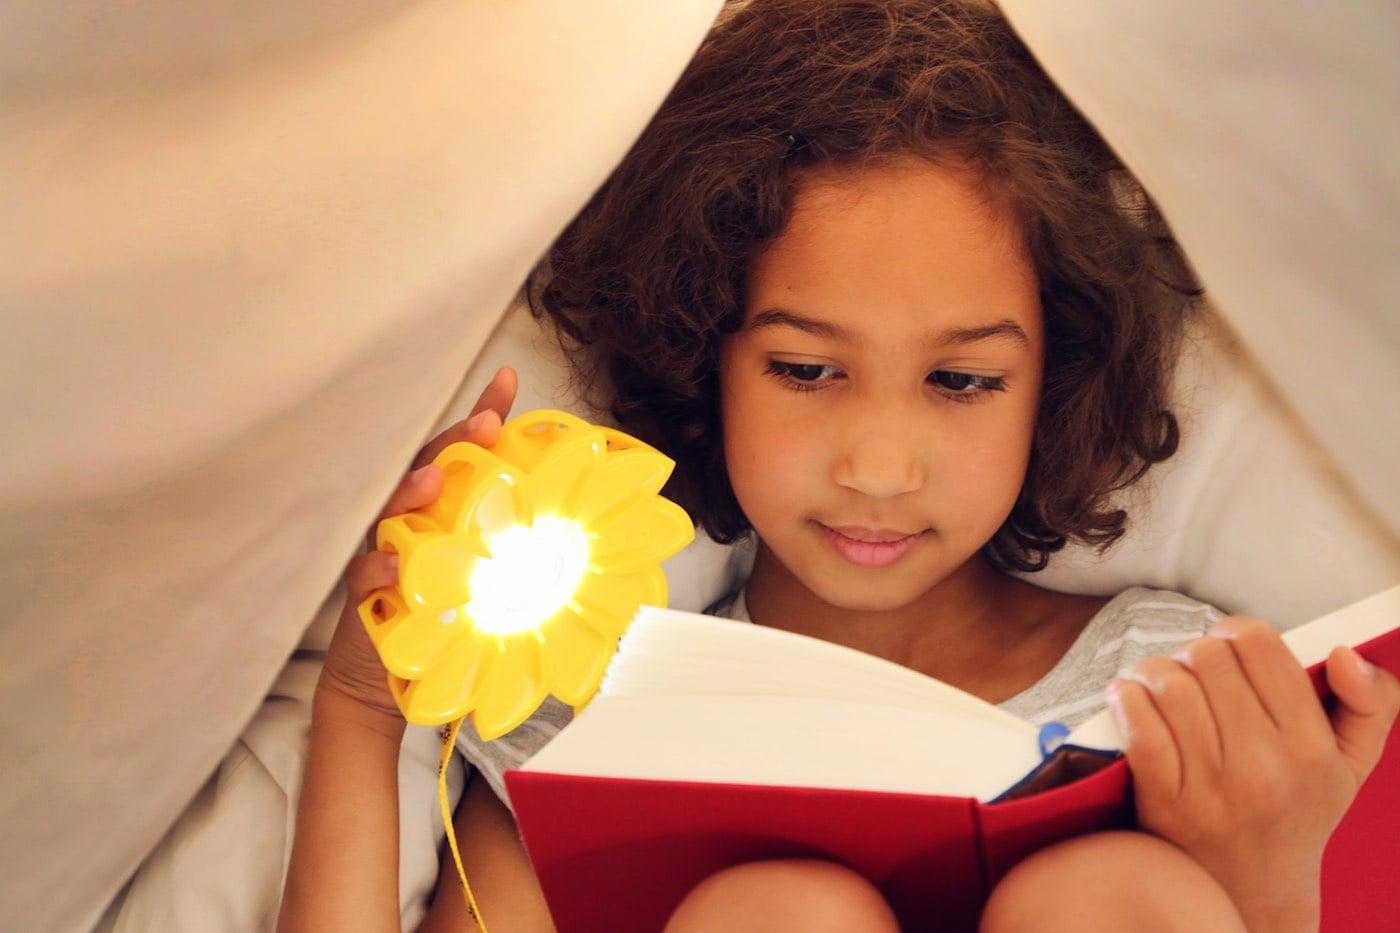 Kinderbücher in Berlin zu Hause lesen // HIMBEER